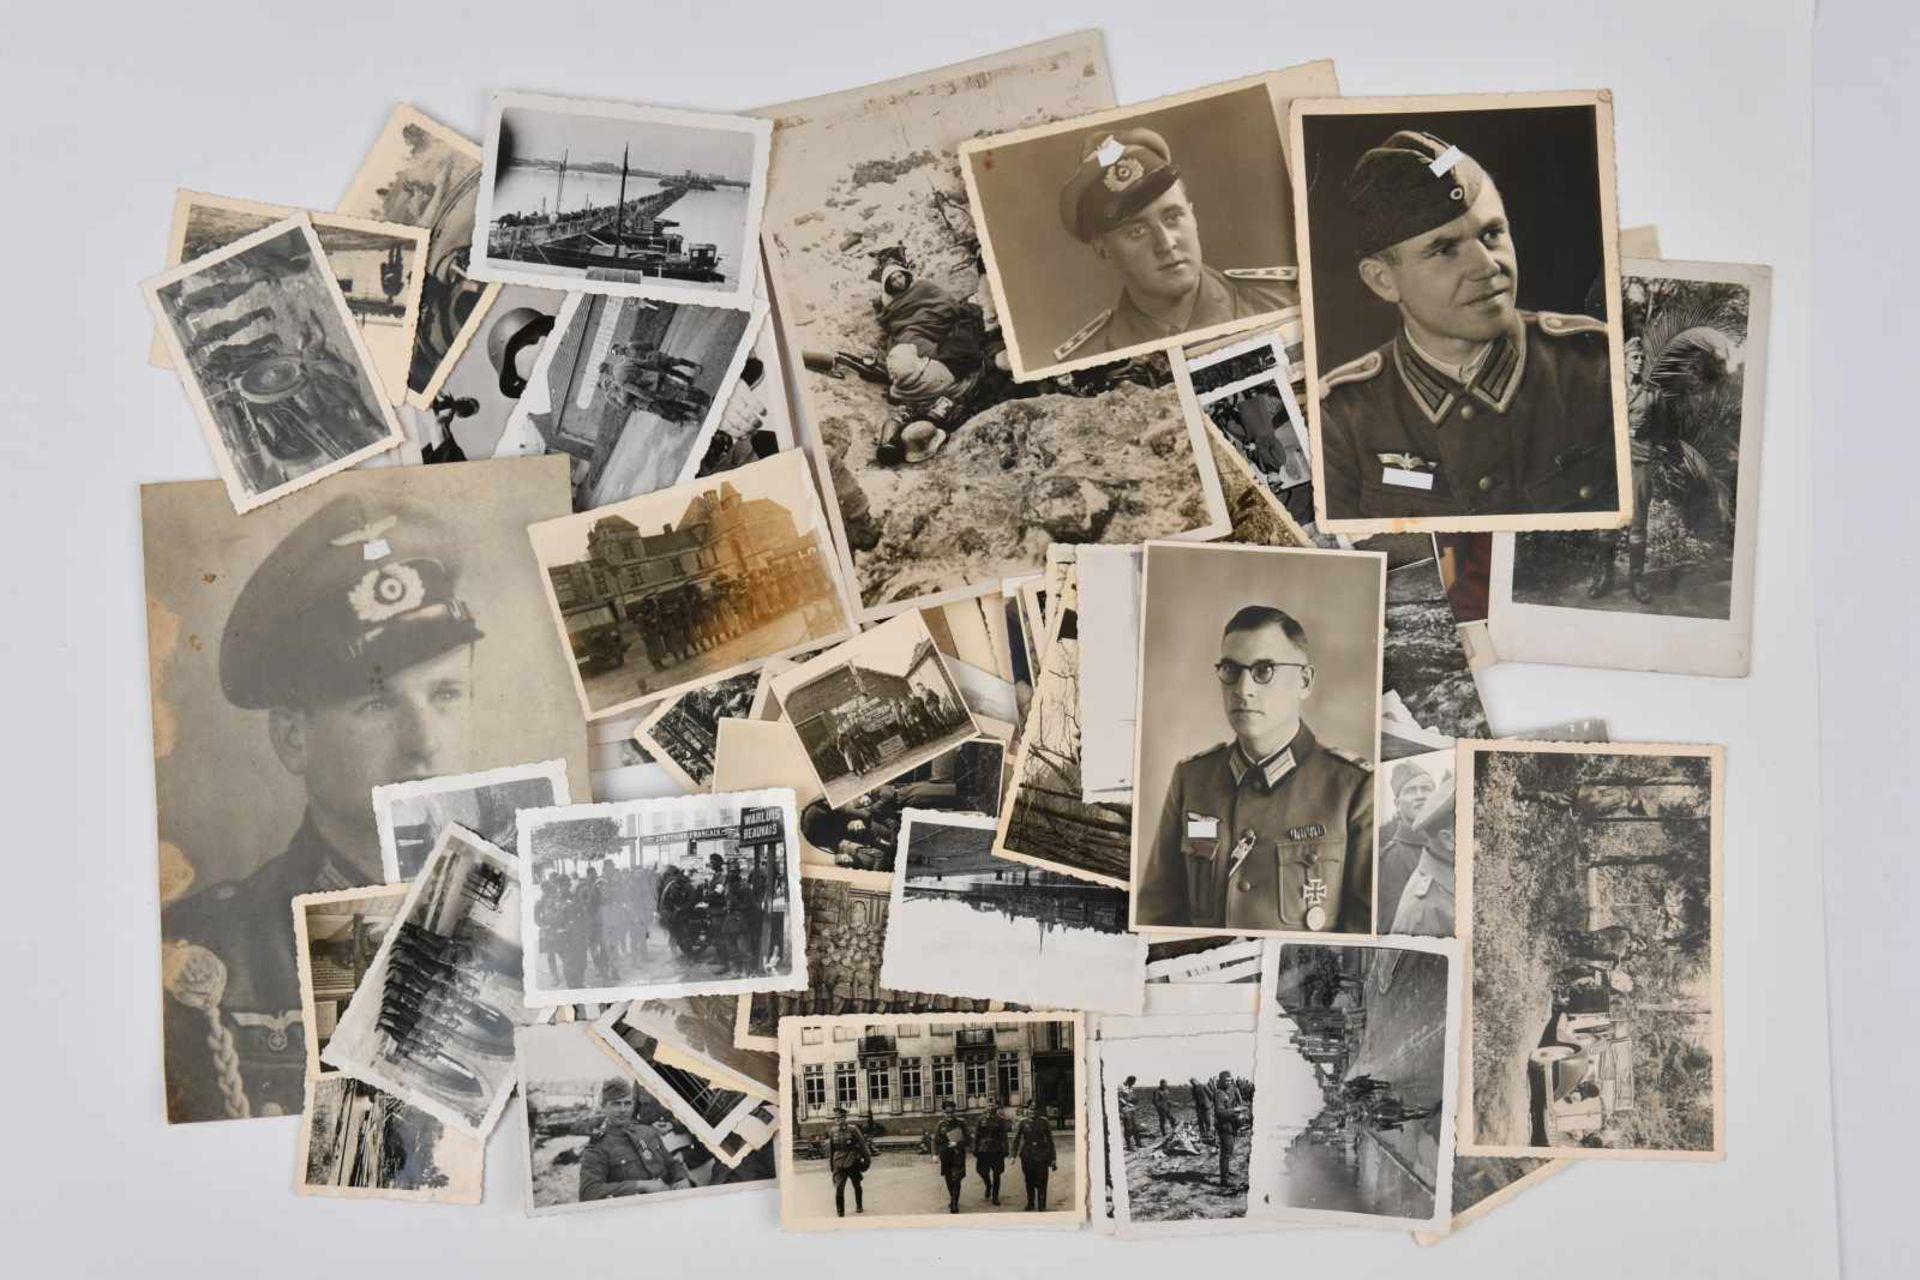 Ensemble de photos de la Heer. Comprenant 131 photos des combats en France 40, en Belgique, en